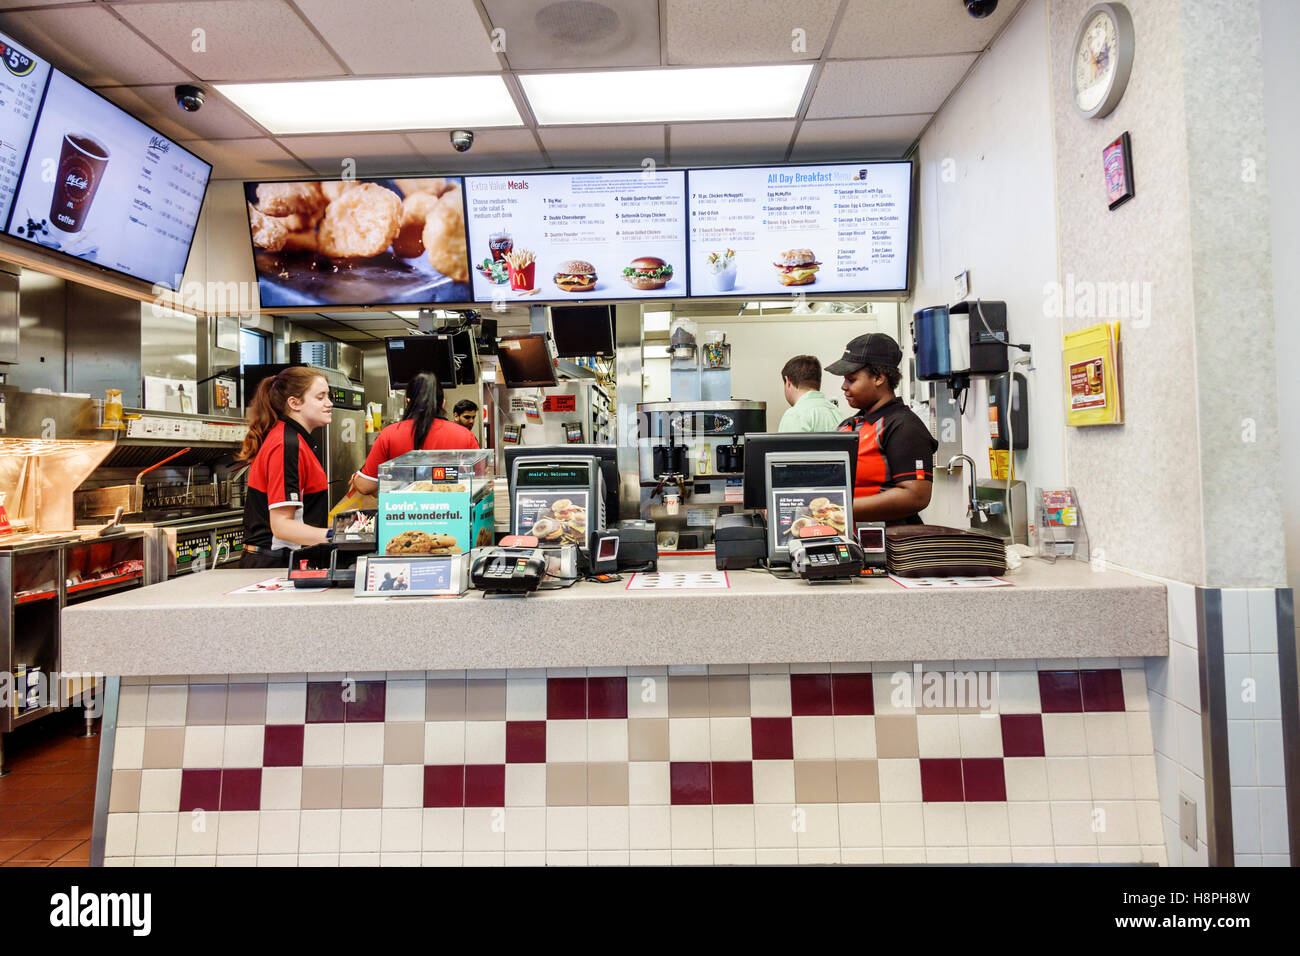 vero beach florida mcdonalds restaurant fast food interior counter cashier woman employees